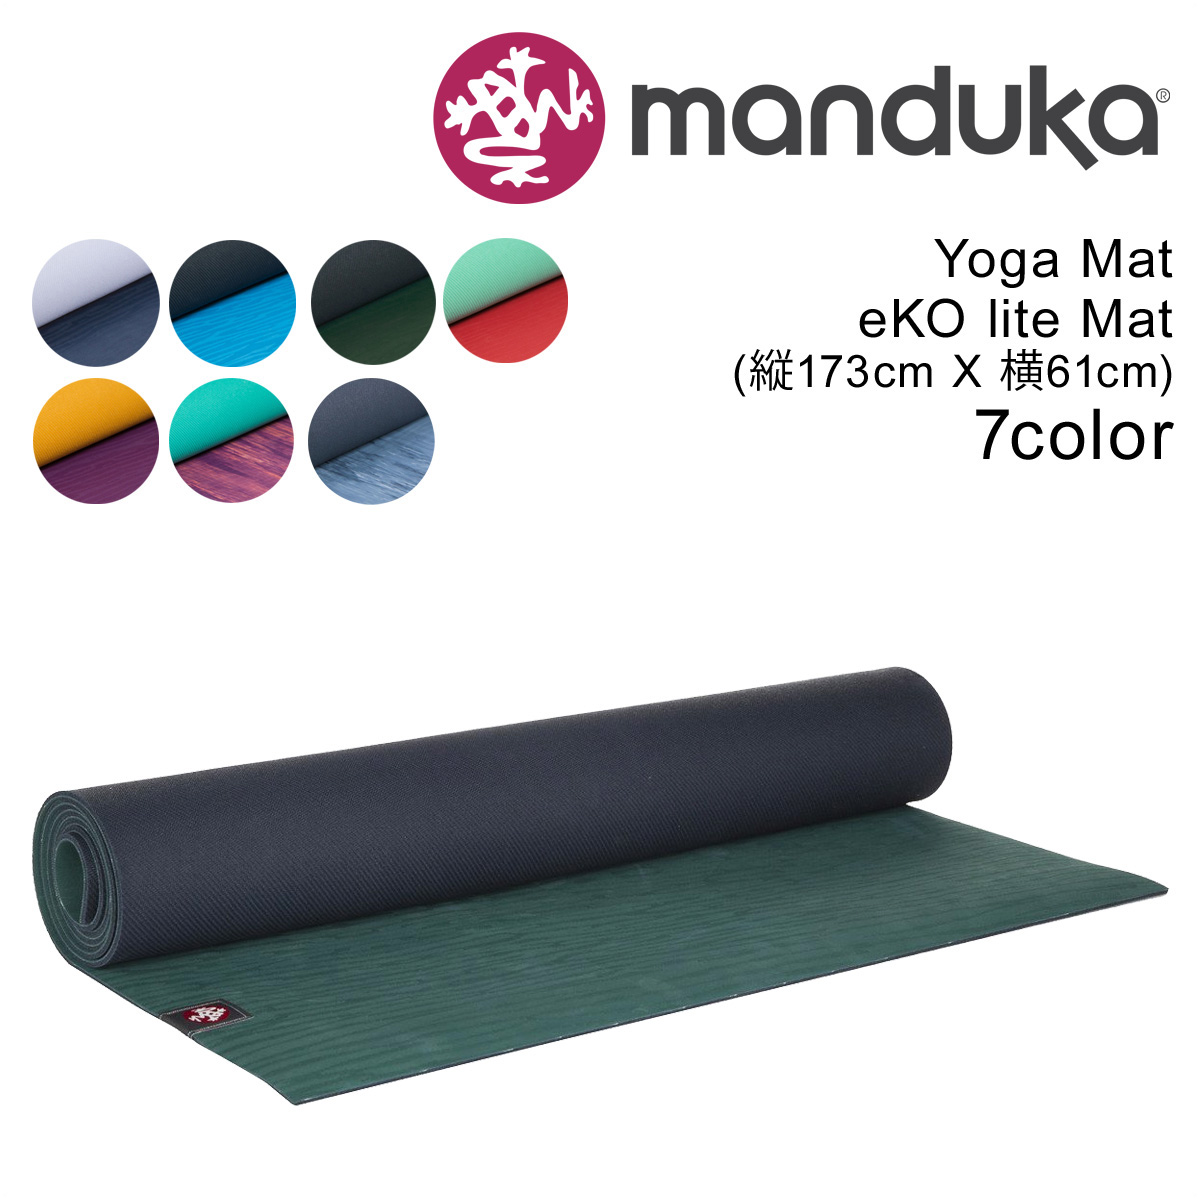 manduka マンドゥカ ヨガマット eKO Lite 173cm×61cm×4mm エコ ライト ピラティス エクササイズ レディース メンズ [175]